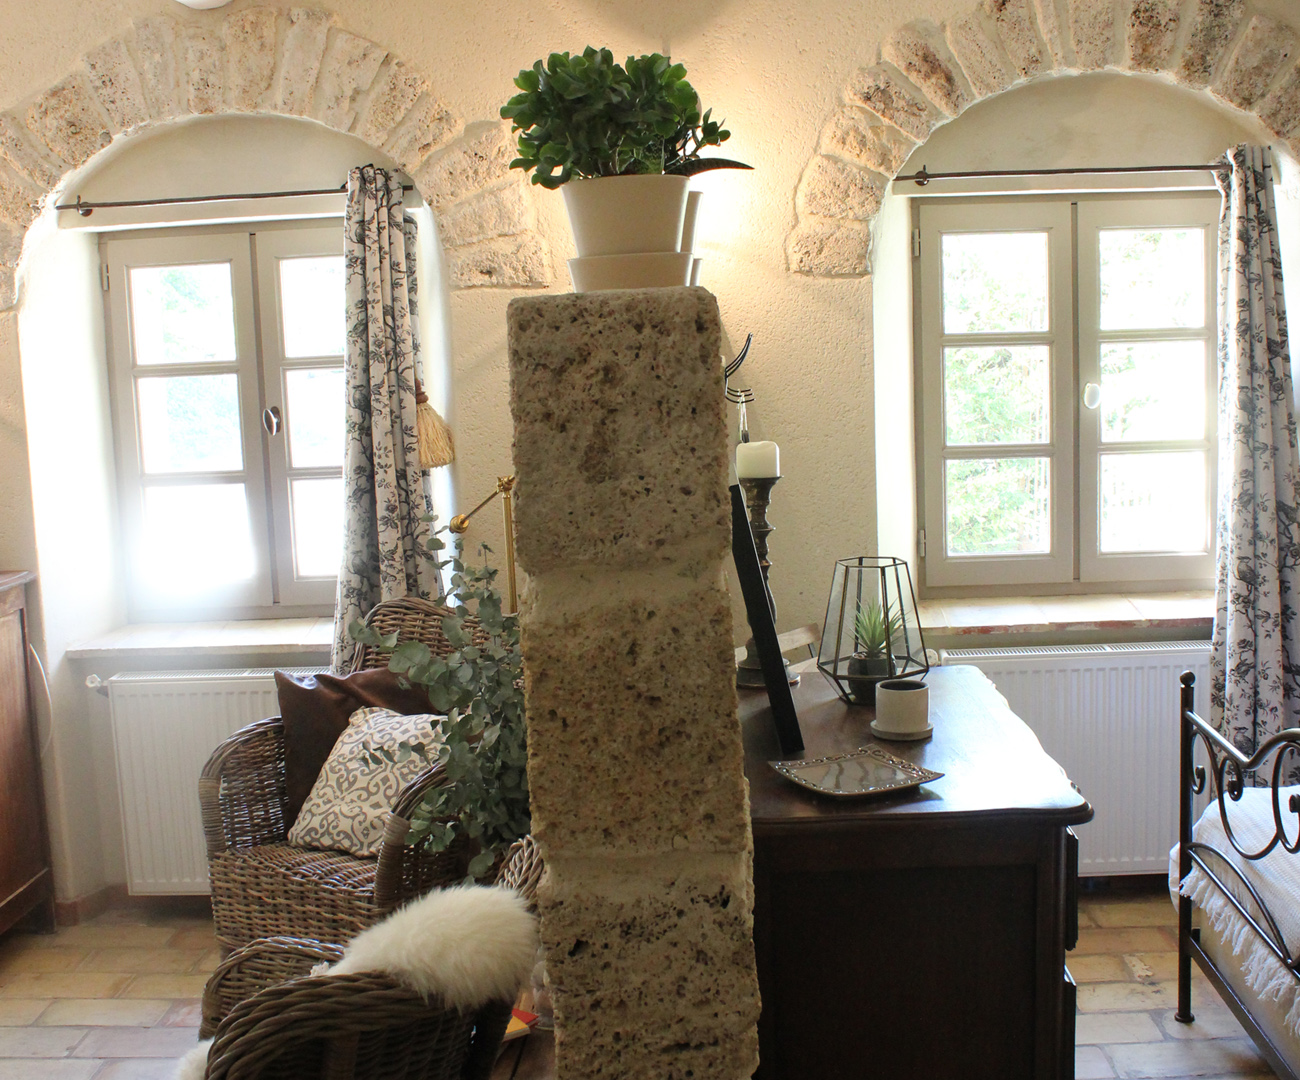 Chambre Provencale Idee Deco gîte mistral - ferme fortia - location de gîtes et chambres